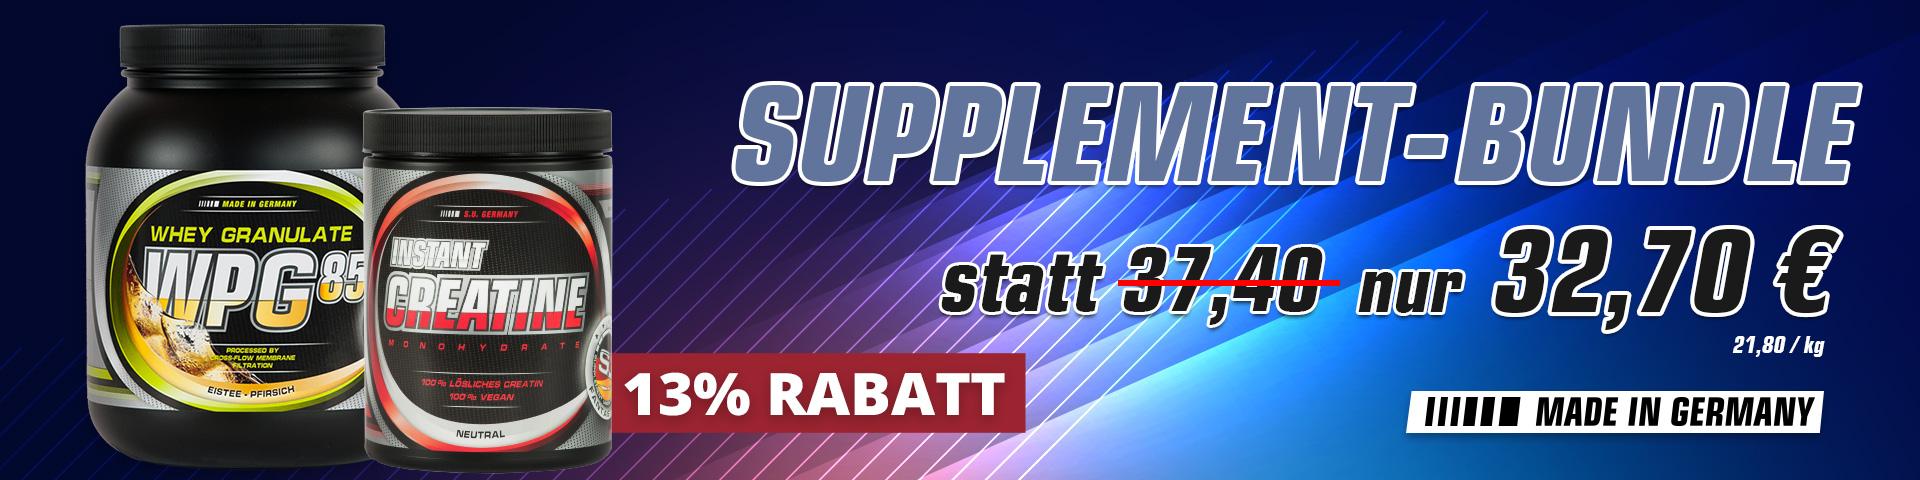 supplement_bundle.jpg